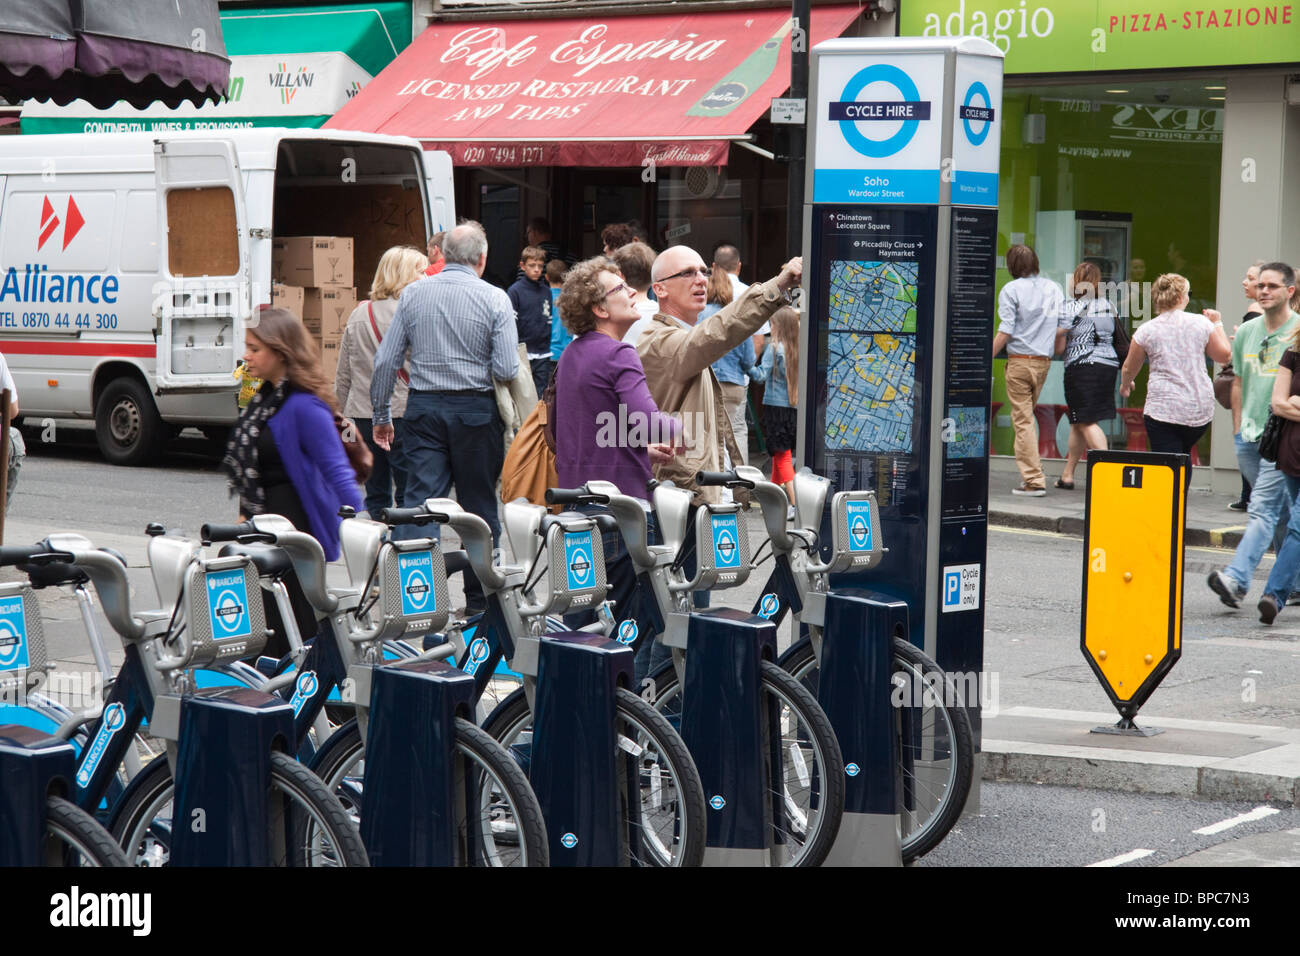 London cycle hire scheme, West End, London, England, UK - Stock Image